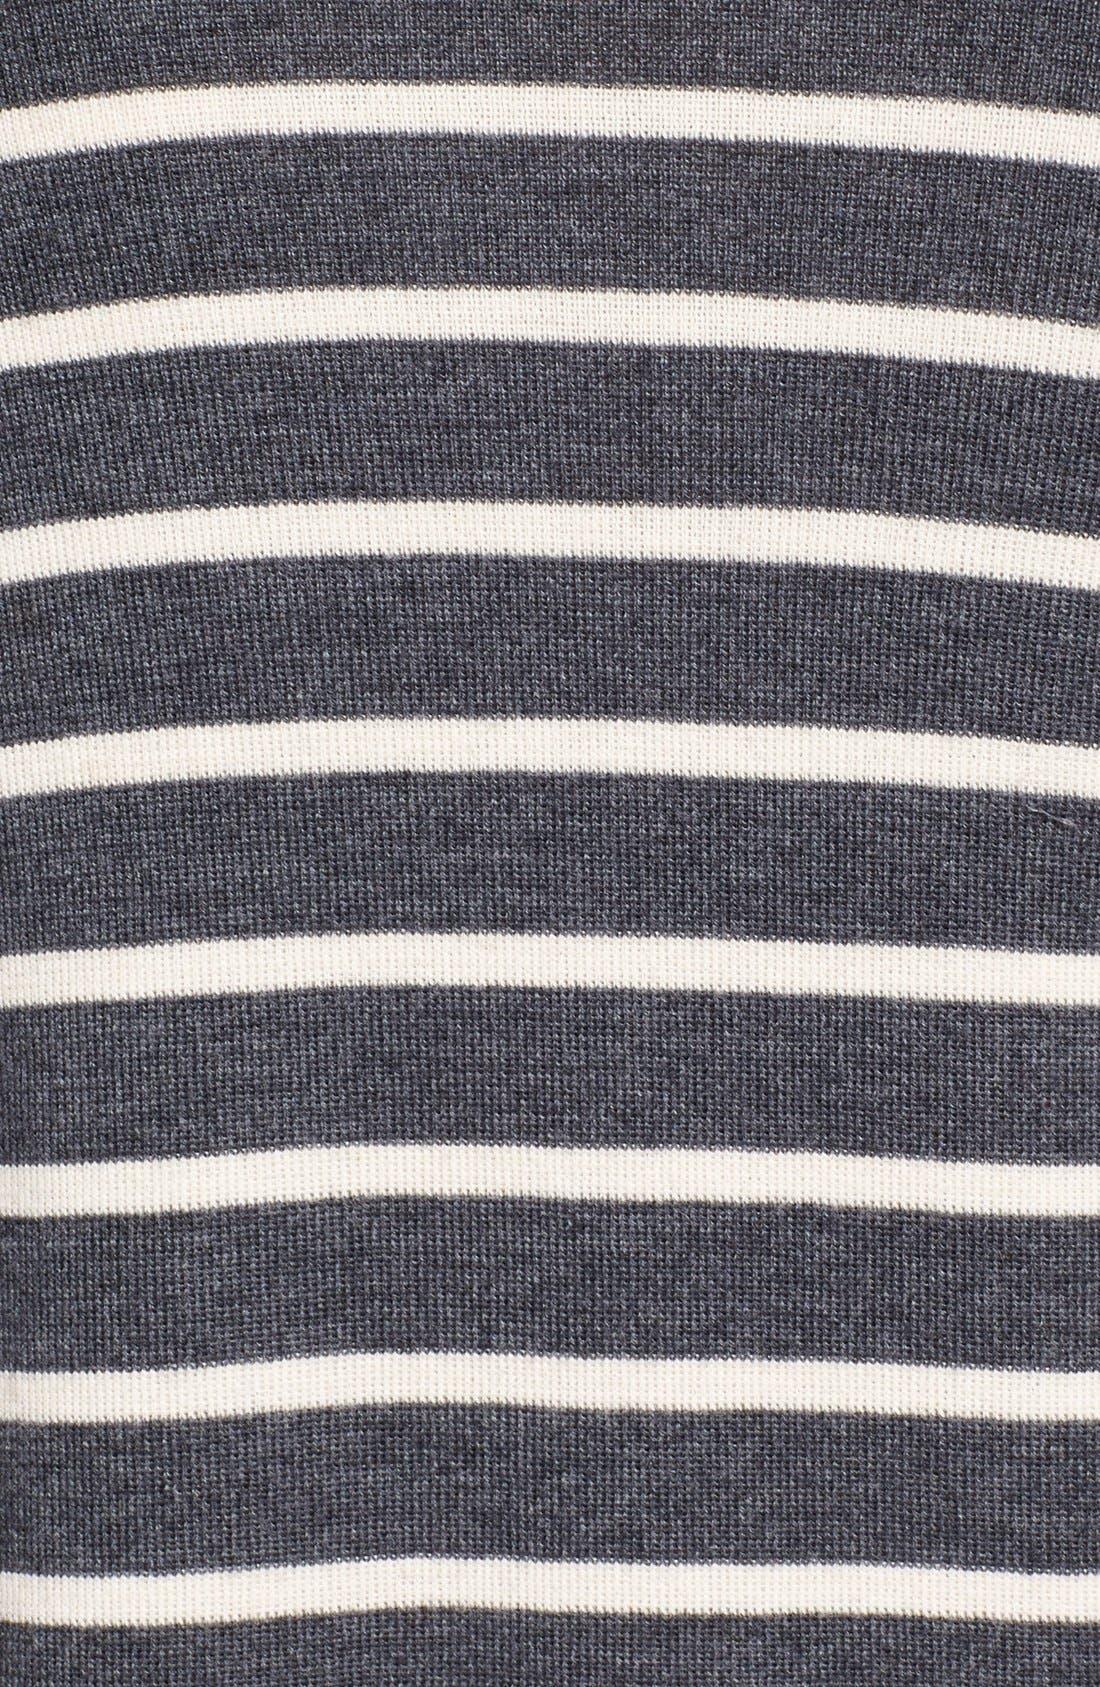 Alternate Image 3  - Tory Burch 'Seraphina' Stripe Tunic